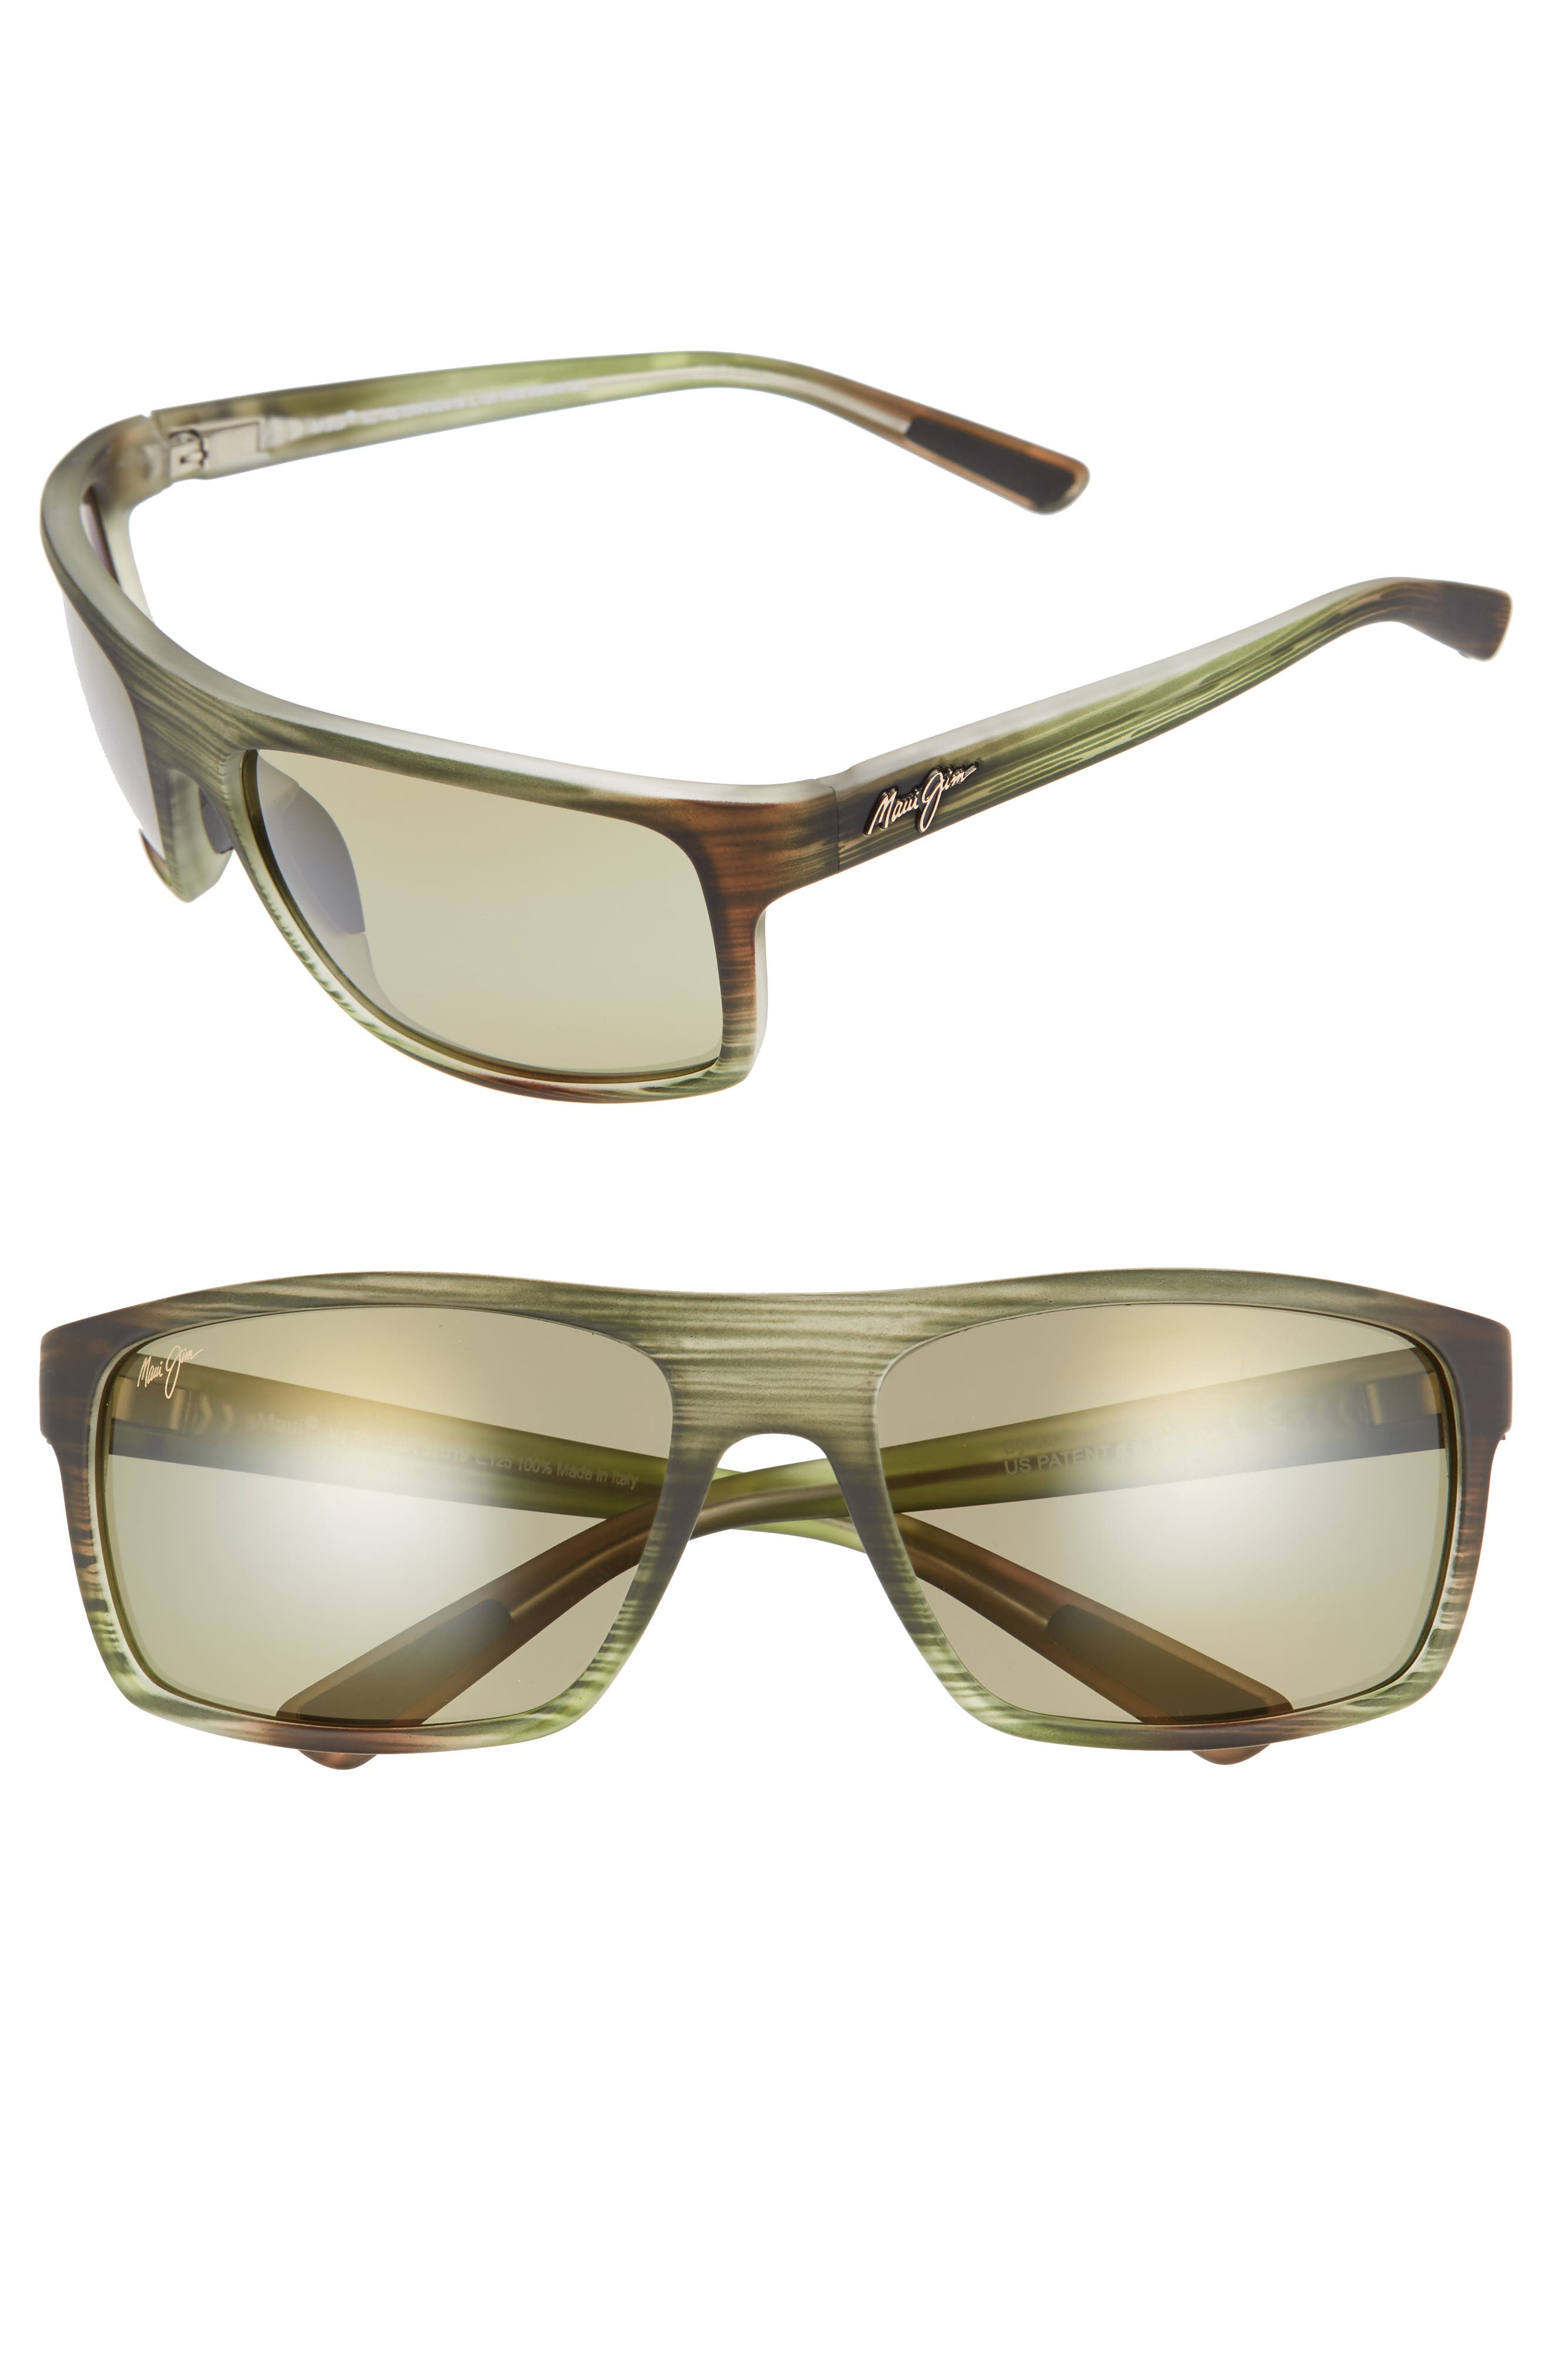 Main Image - Maui Jim Byron Bay 62mm Polarized Sunglasses